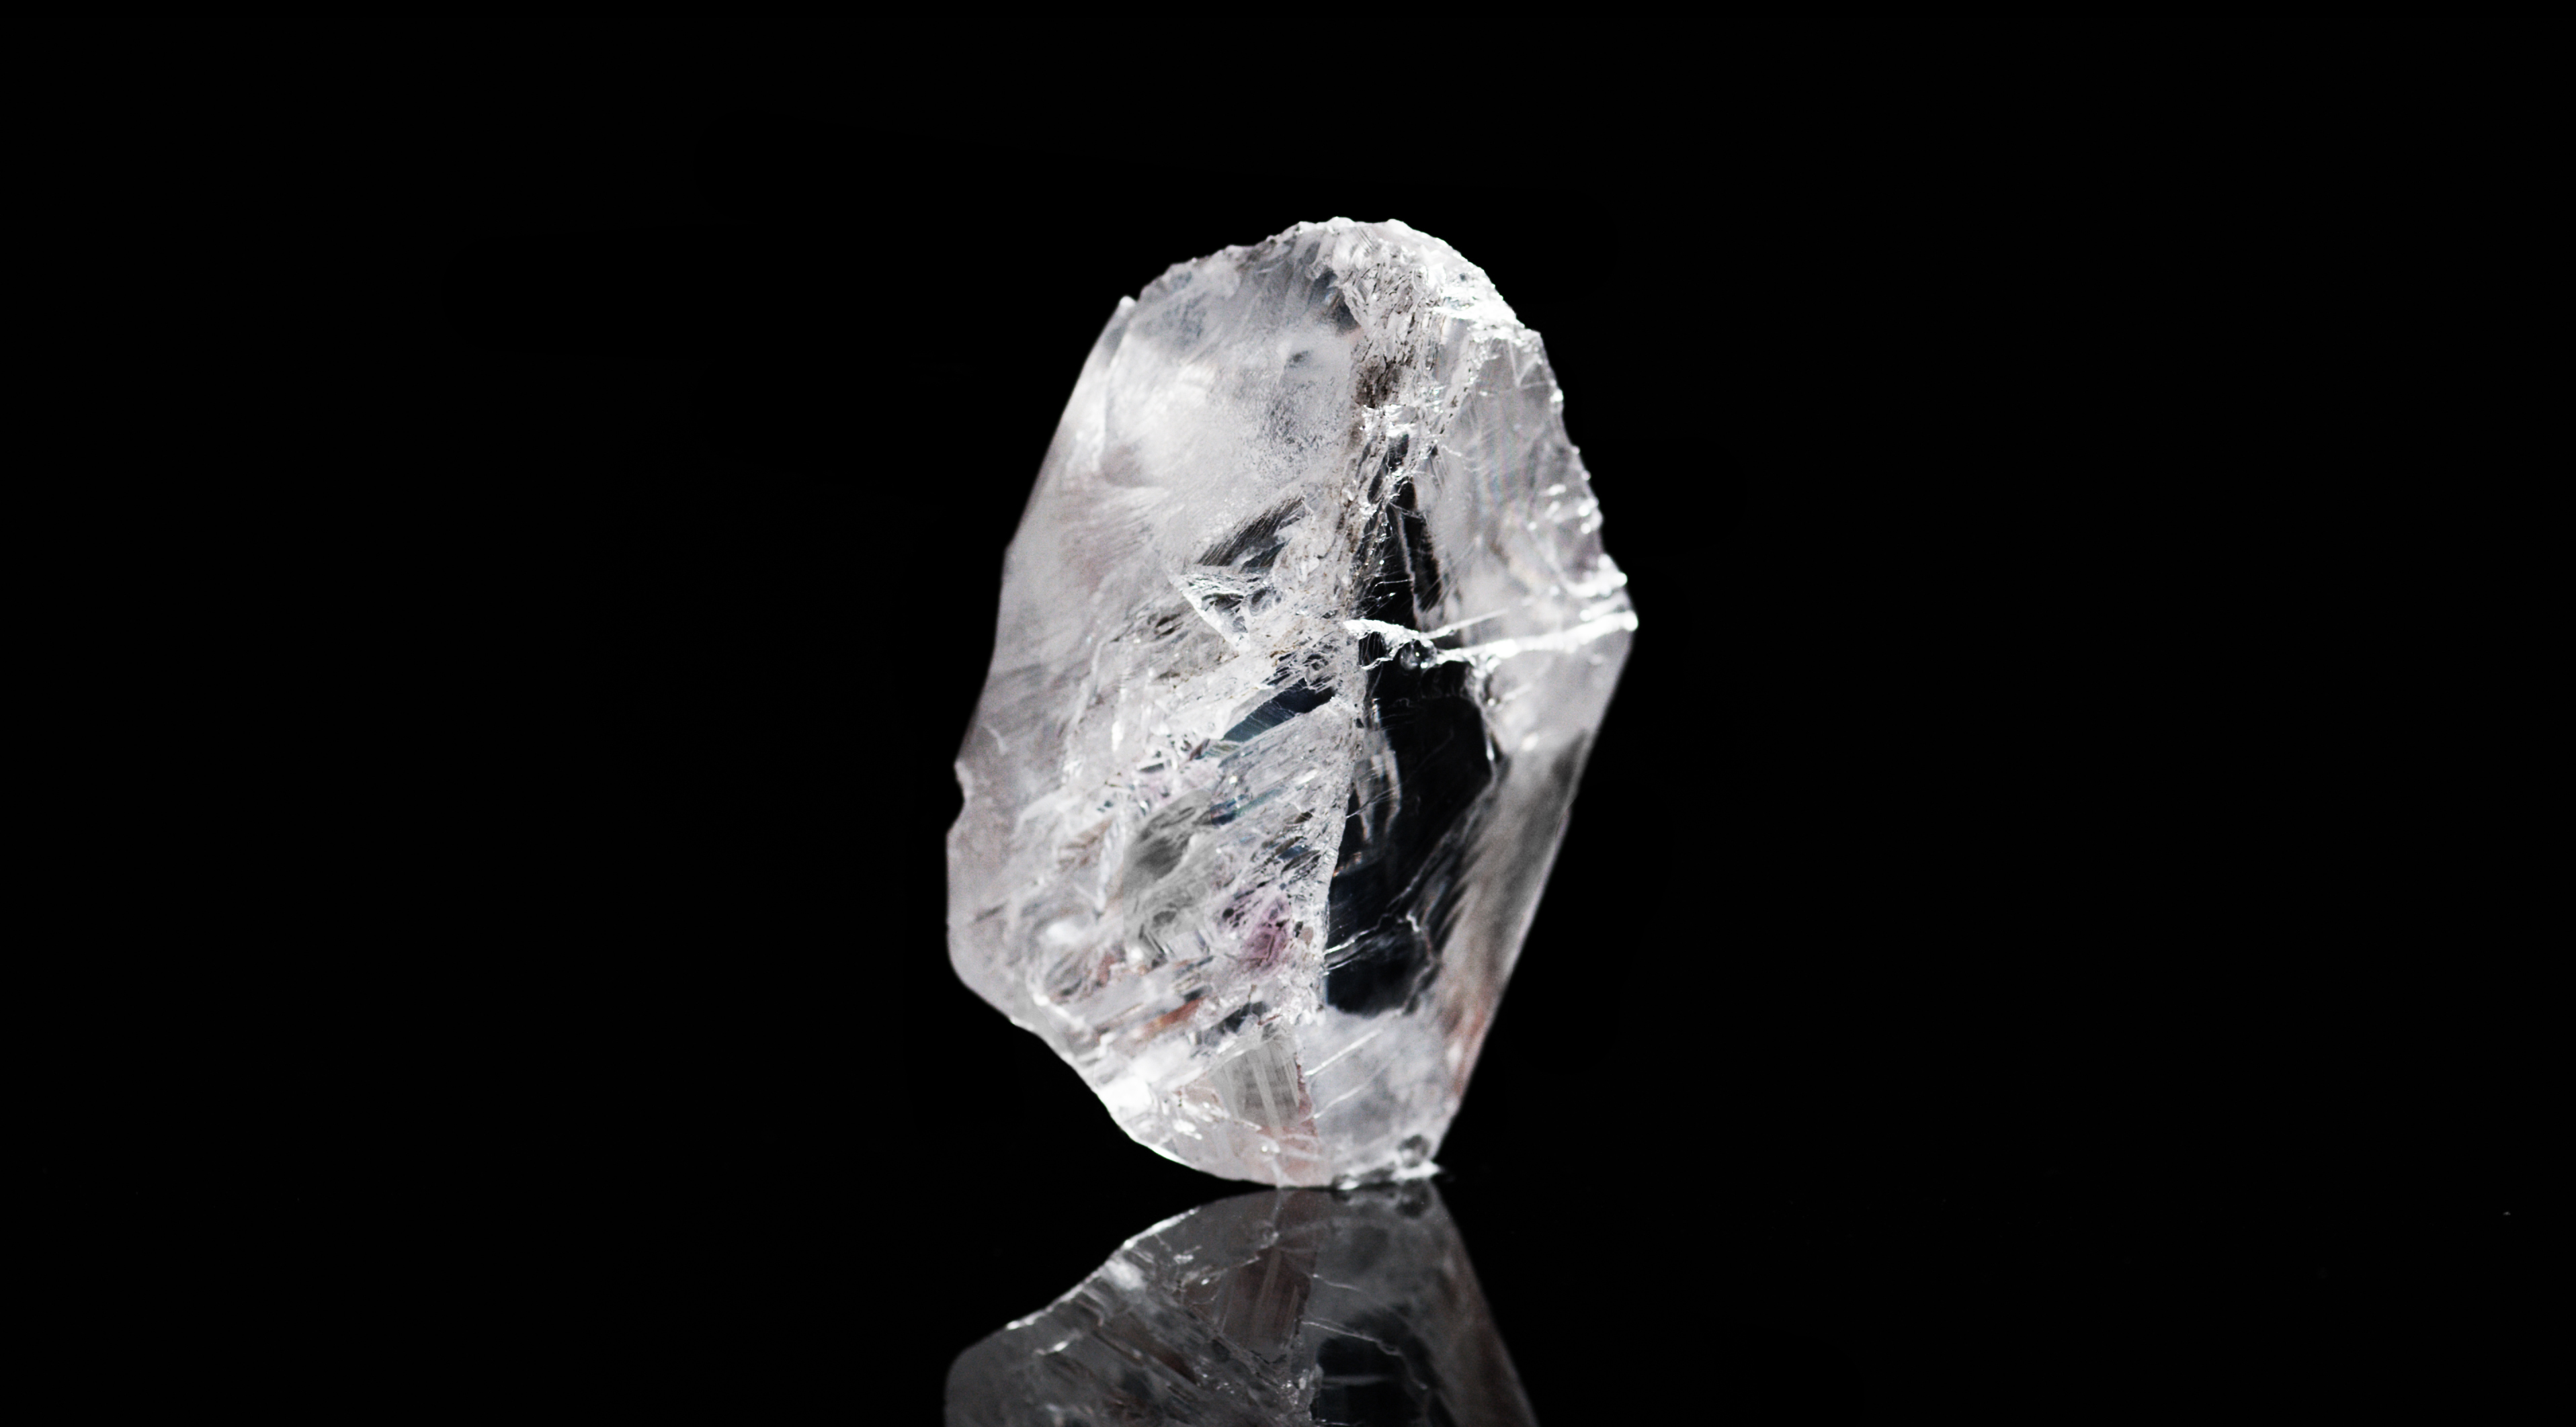 The 813-carat rough diamond dubbed The Constellation